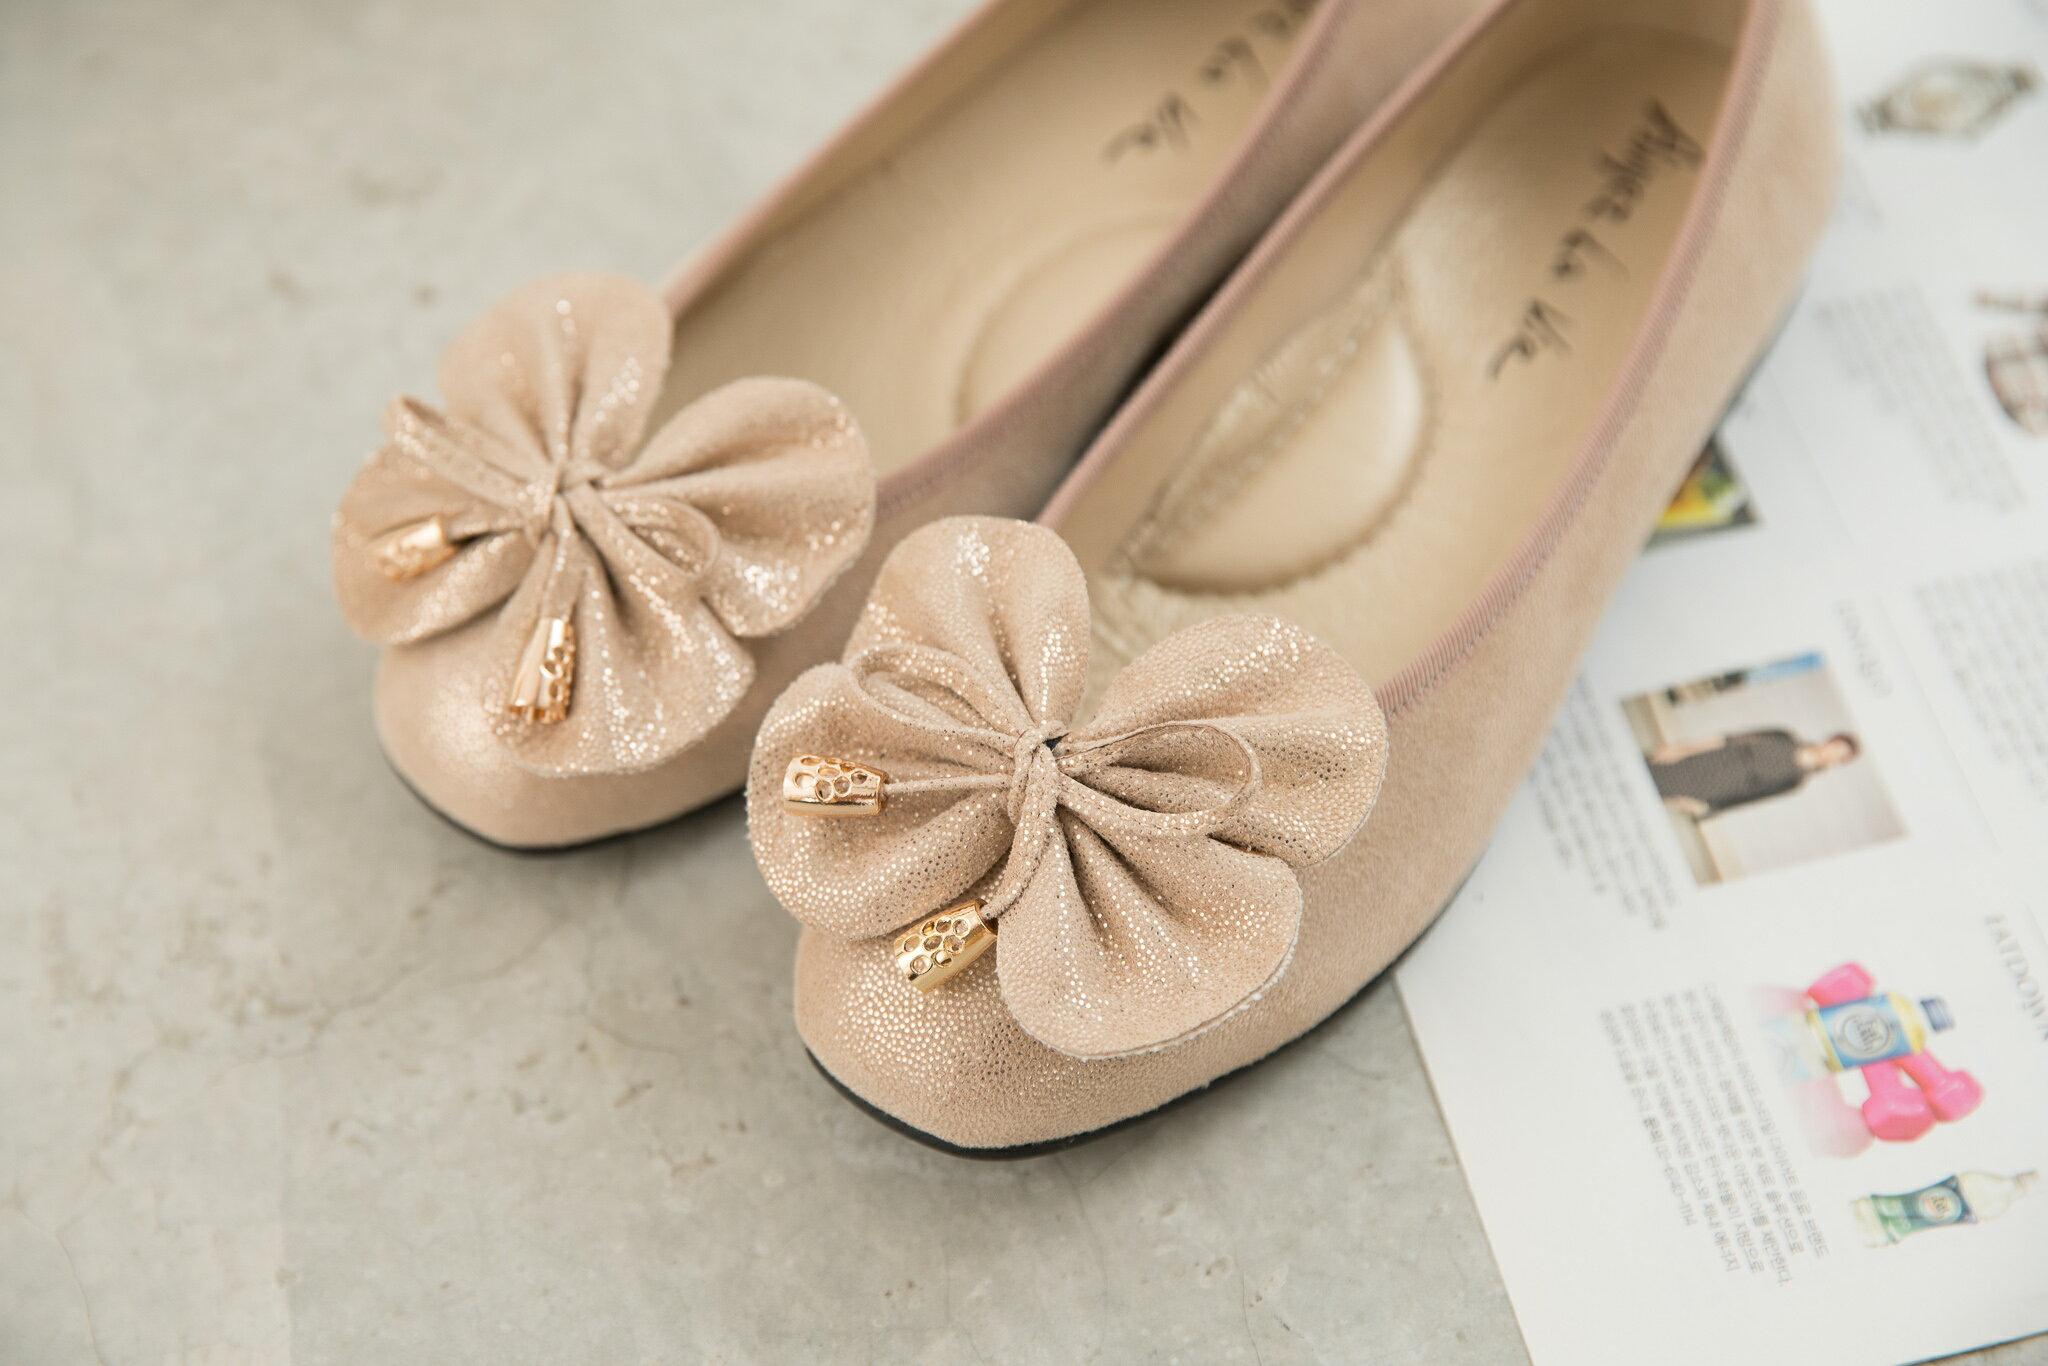 Aimez La Vie 經典優雅|大蝴蝶結金屬頭真皮平底娃娃鞋 0